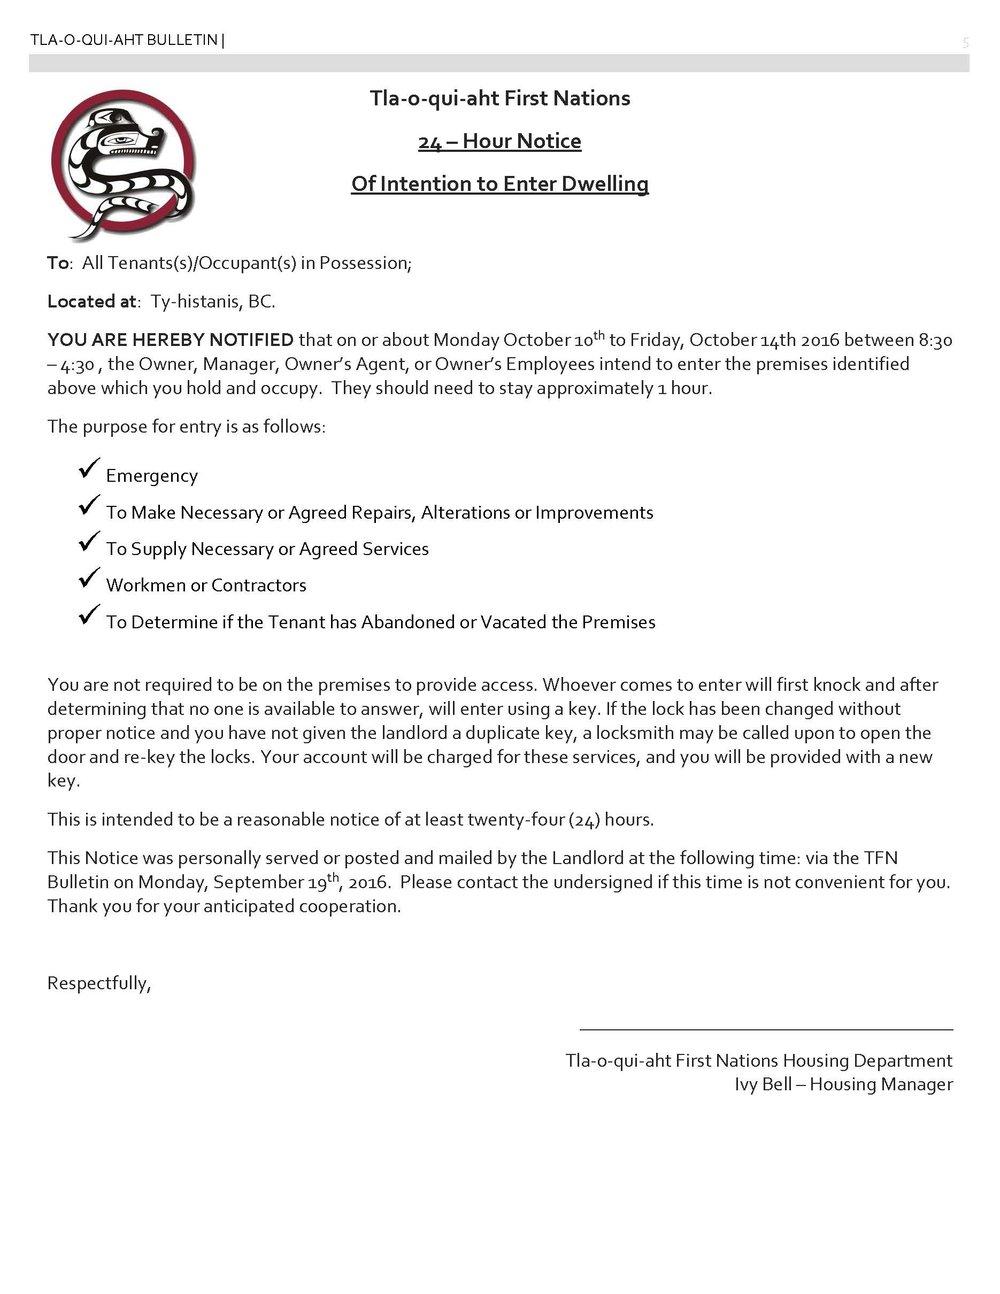 TFN Bulletin Sept 19-2016_Page_05.jpg